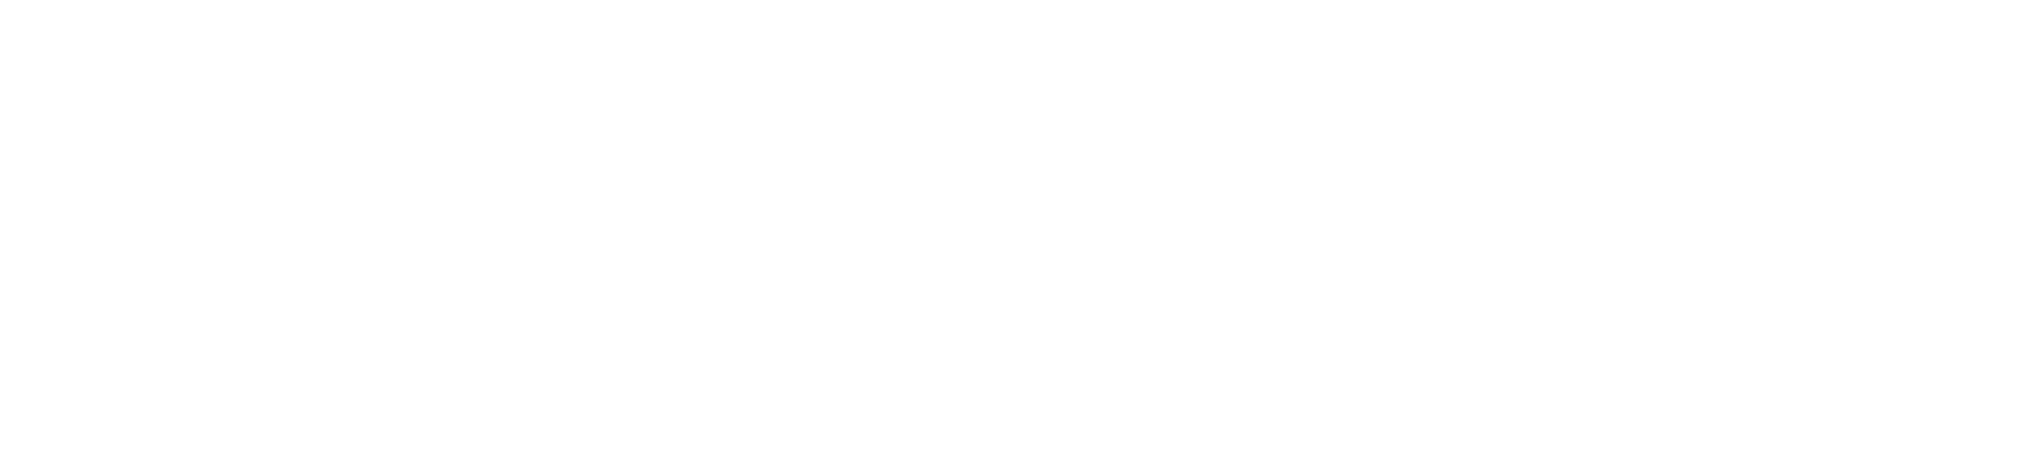 EasyFit Garden Lights